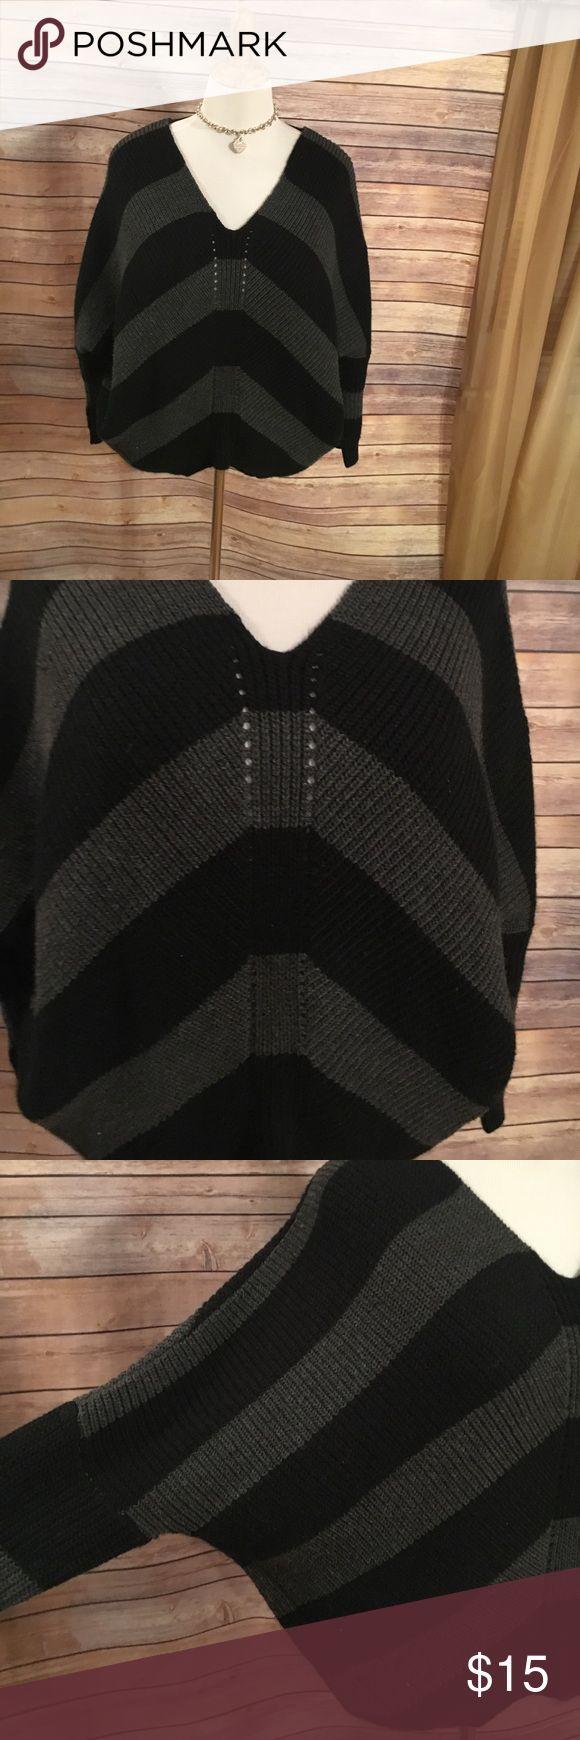 Charlotte rouse size medium large Bat winged black and grey striped vneck sweater Charlotte Russe Sweaters V-Necks